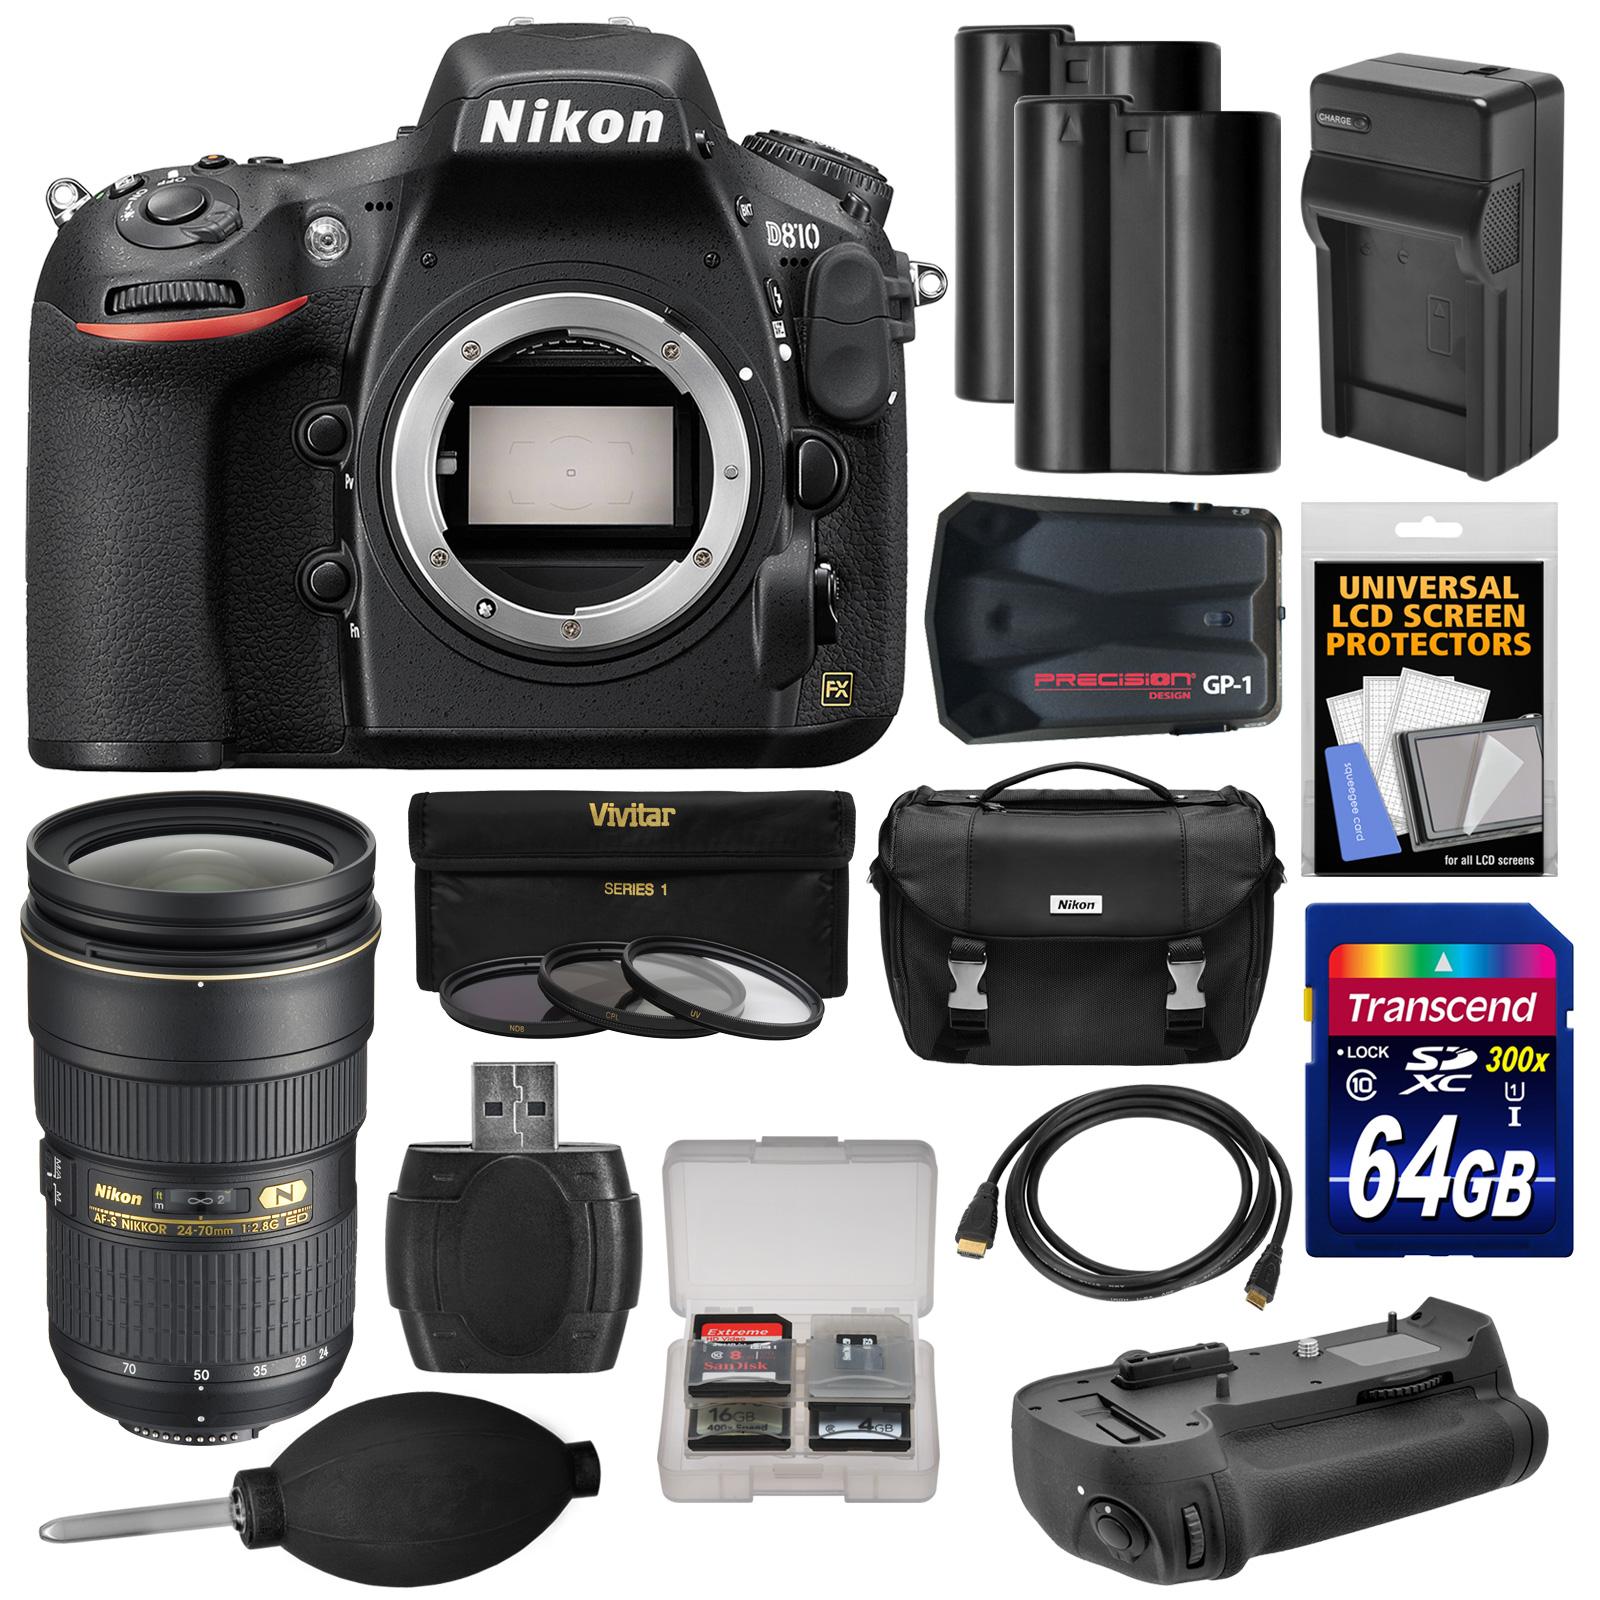 Nikon D810 Digital SLR Camera Body with 24 - 70mm f / 2.8G Lens + 64GB Card + 2 Batteries / Charger + Case + GPS + Grip + Kit